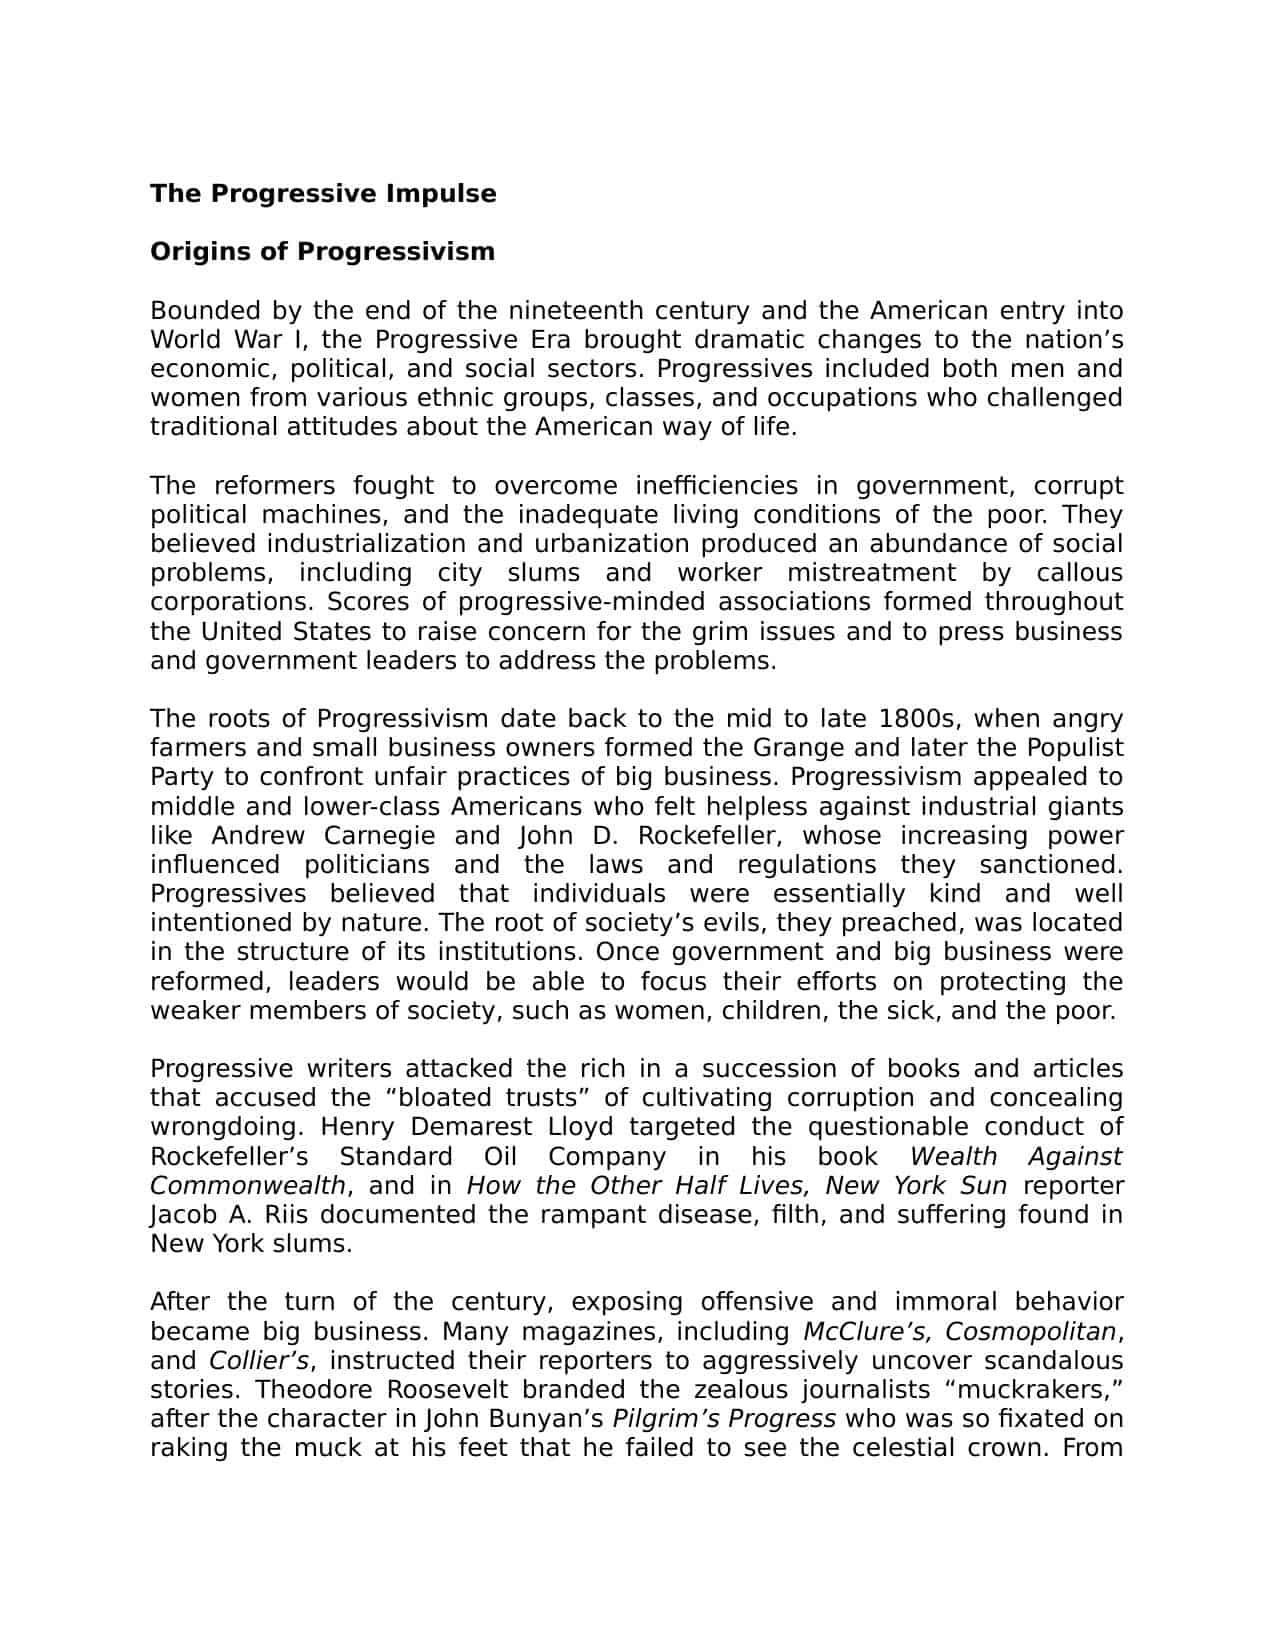 The Progressive Era Worksheet the Progressive Impulse A Level Revision Notes